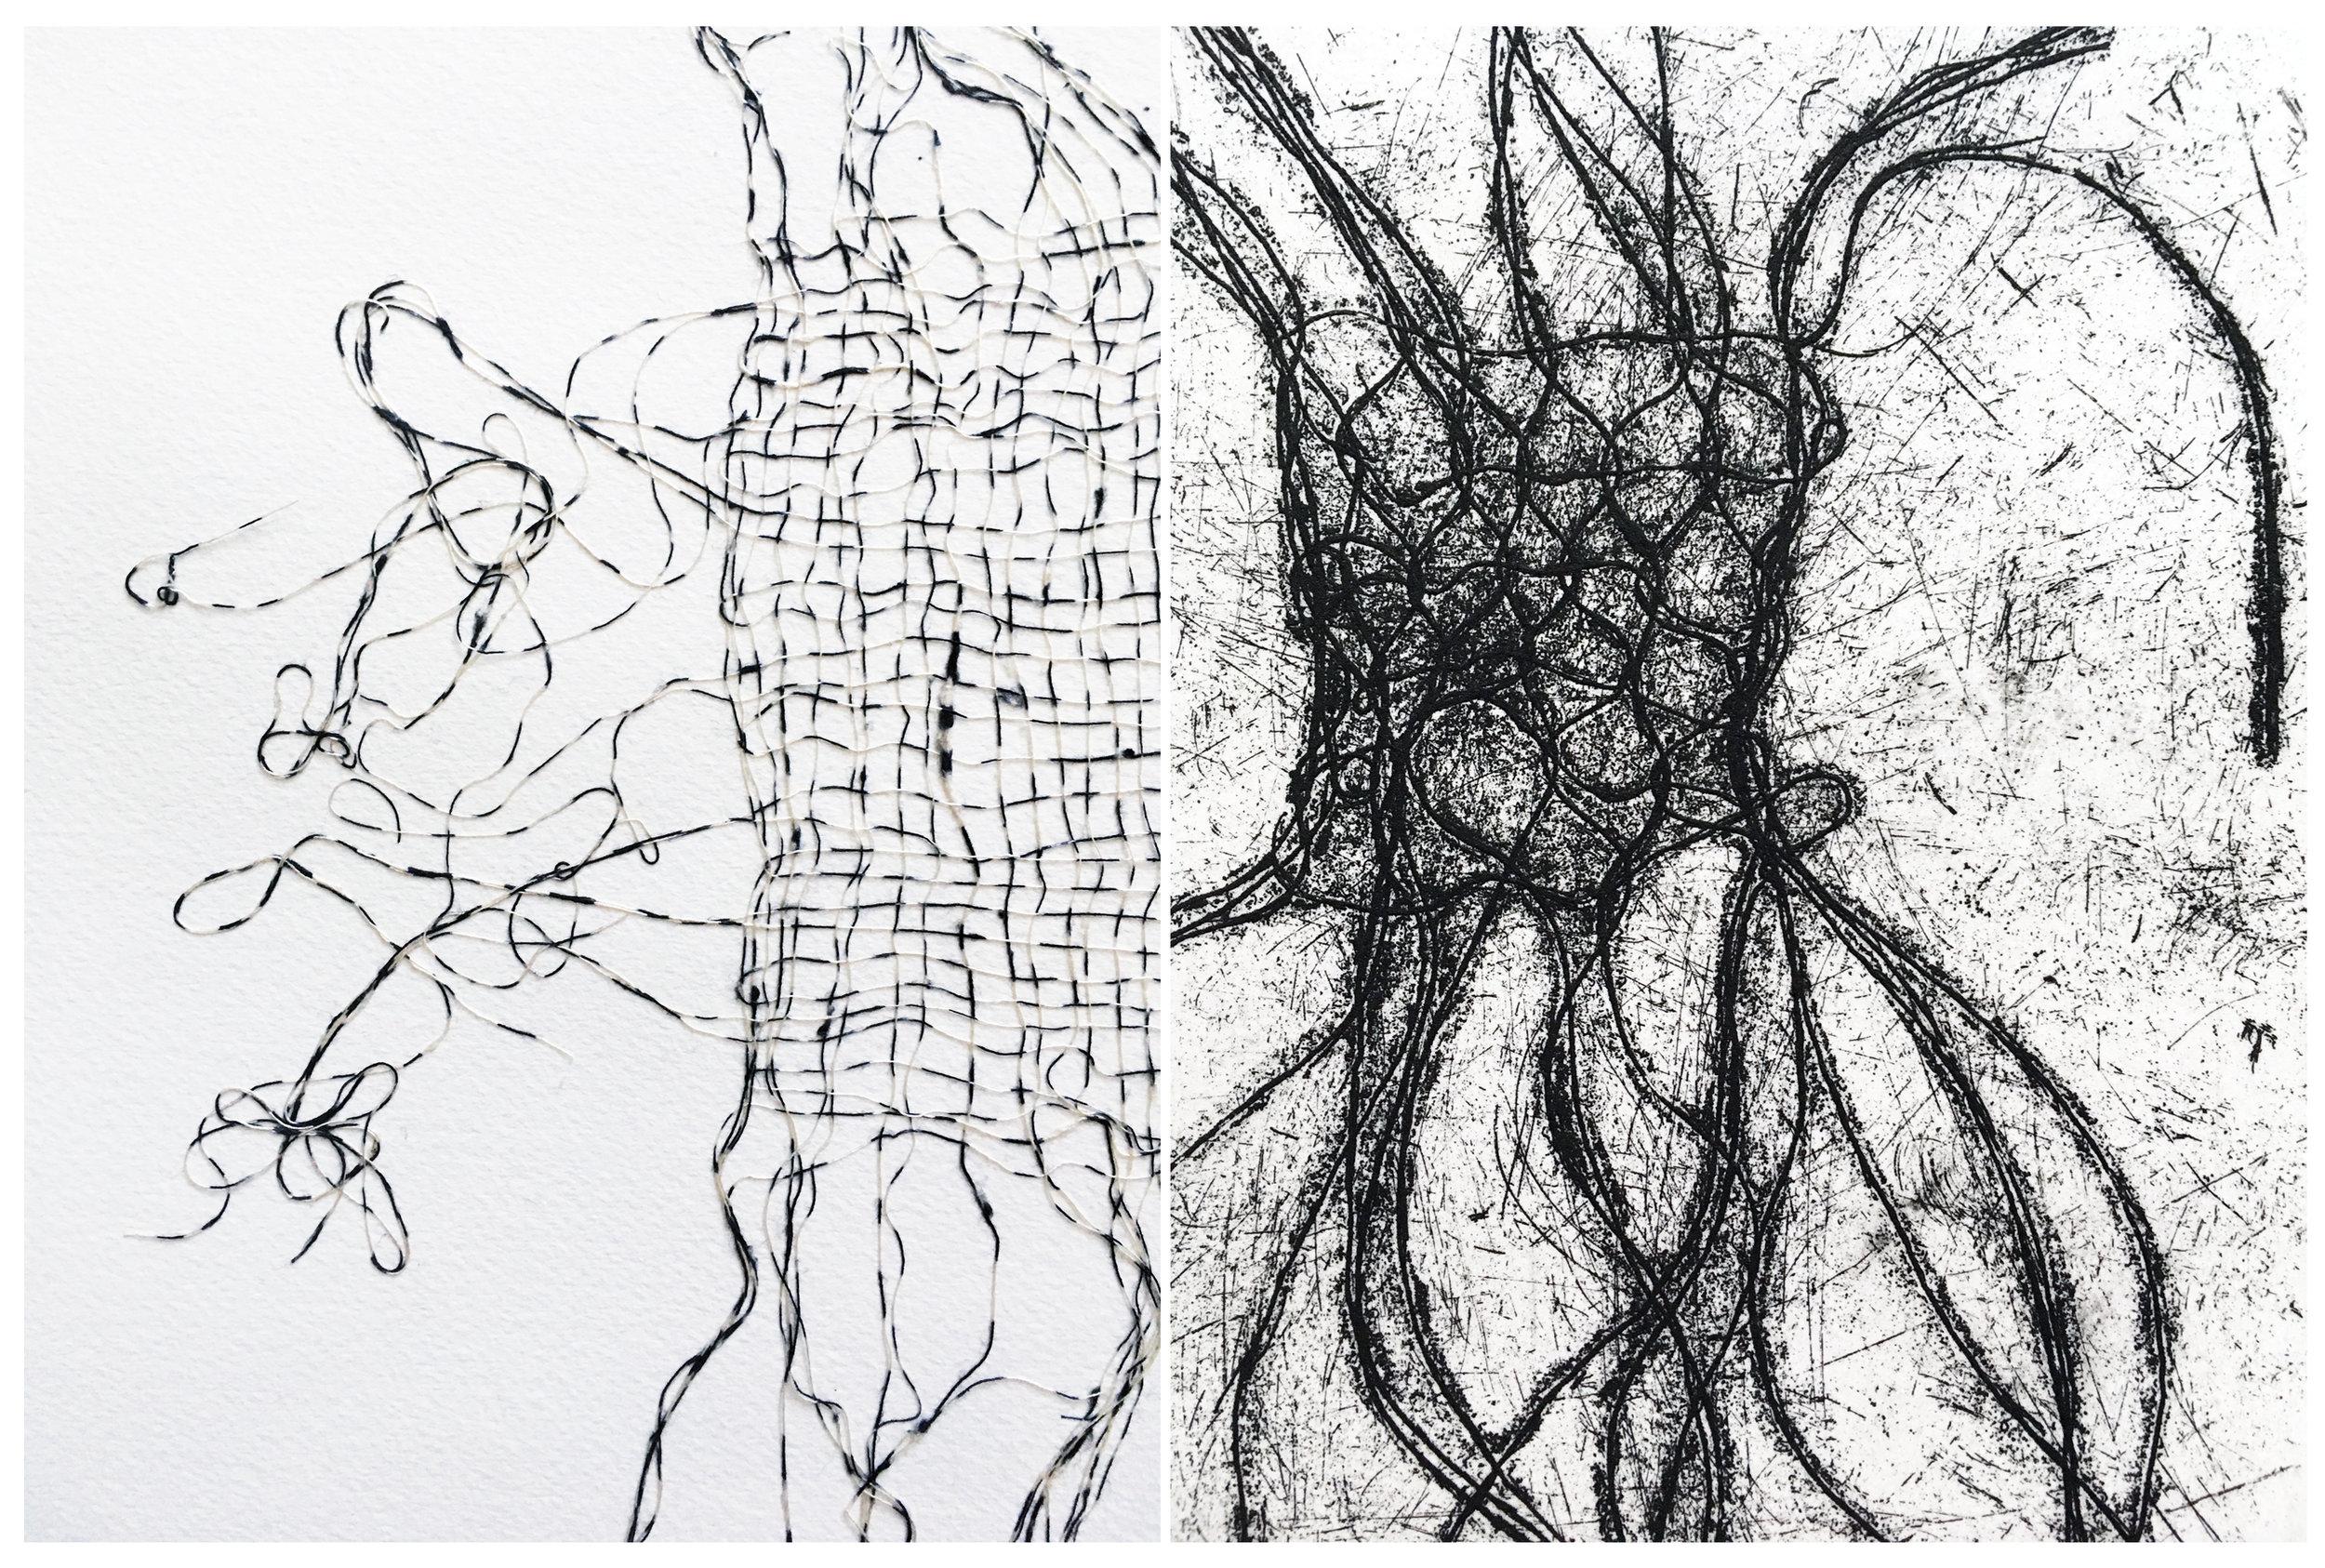 Desert Wayfarer I,   2016,cotton threads, 21 1/2 x 25 1/2 inches framed    Desert Aura Print II  , 2017, oil on cotton paper, 12 x 20 inches unframed